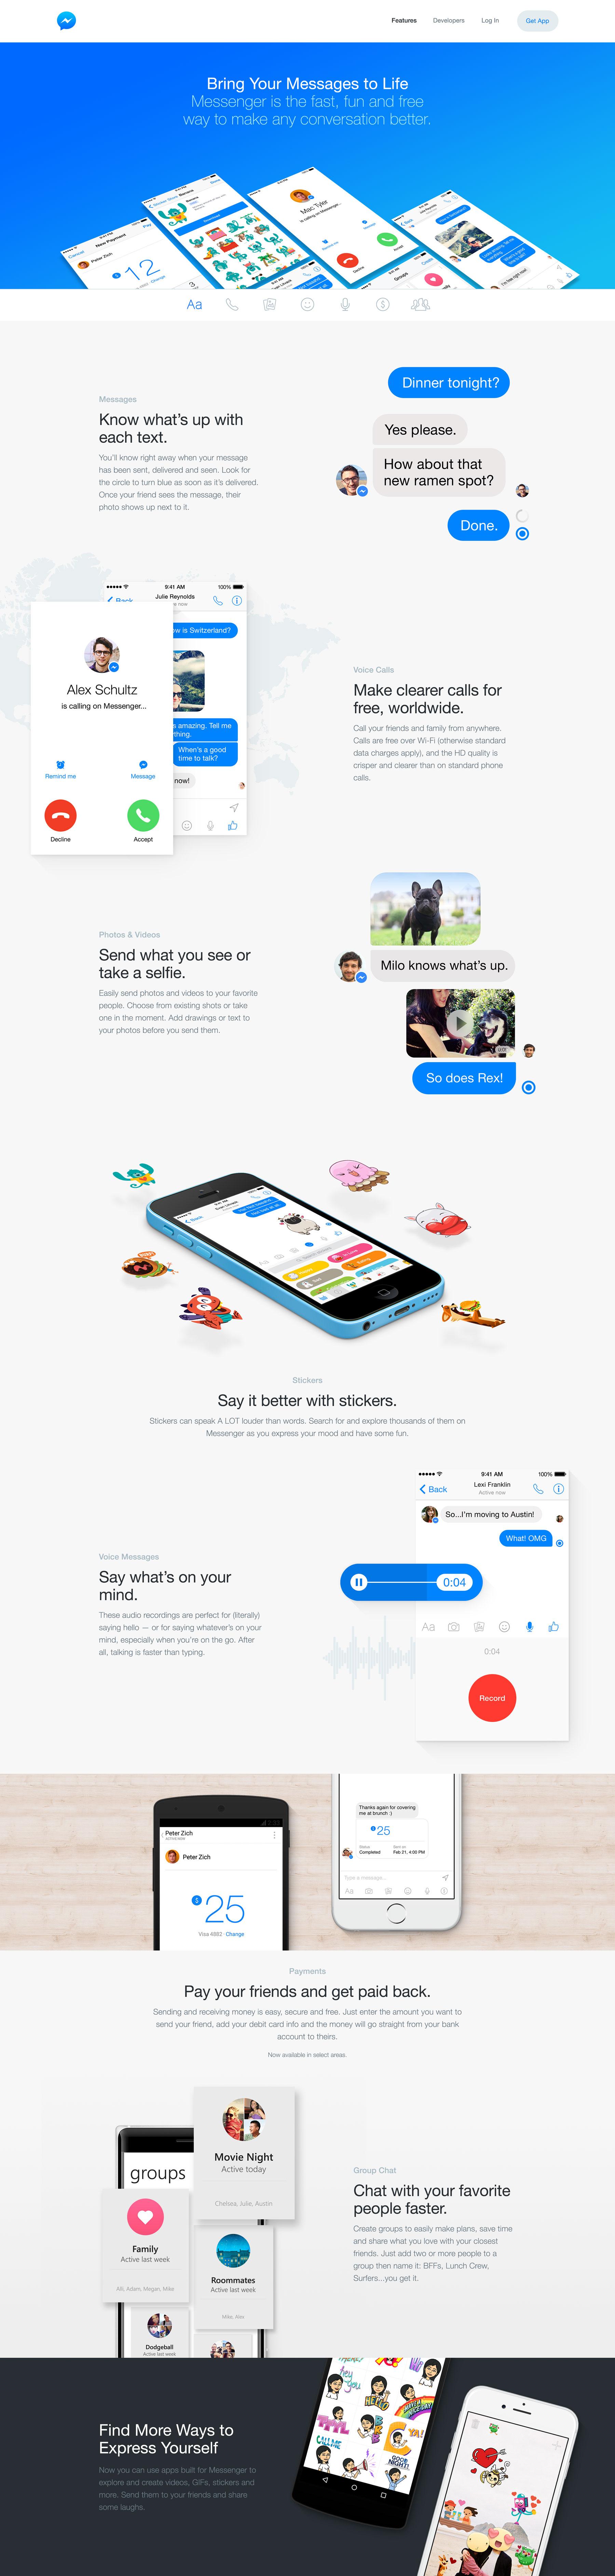 messenger-features-desktop